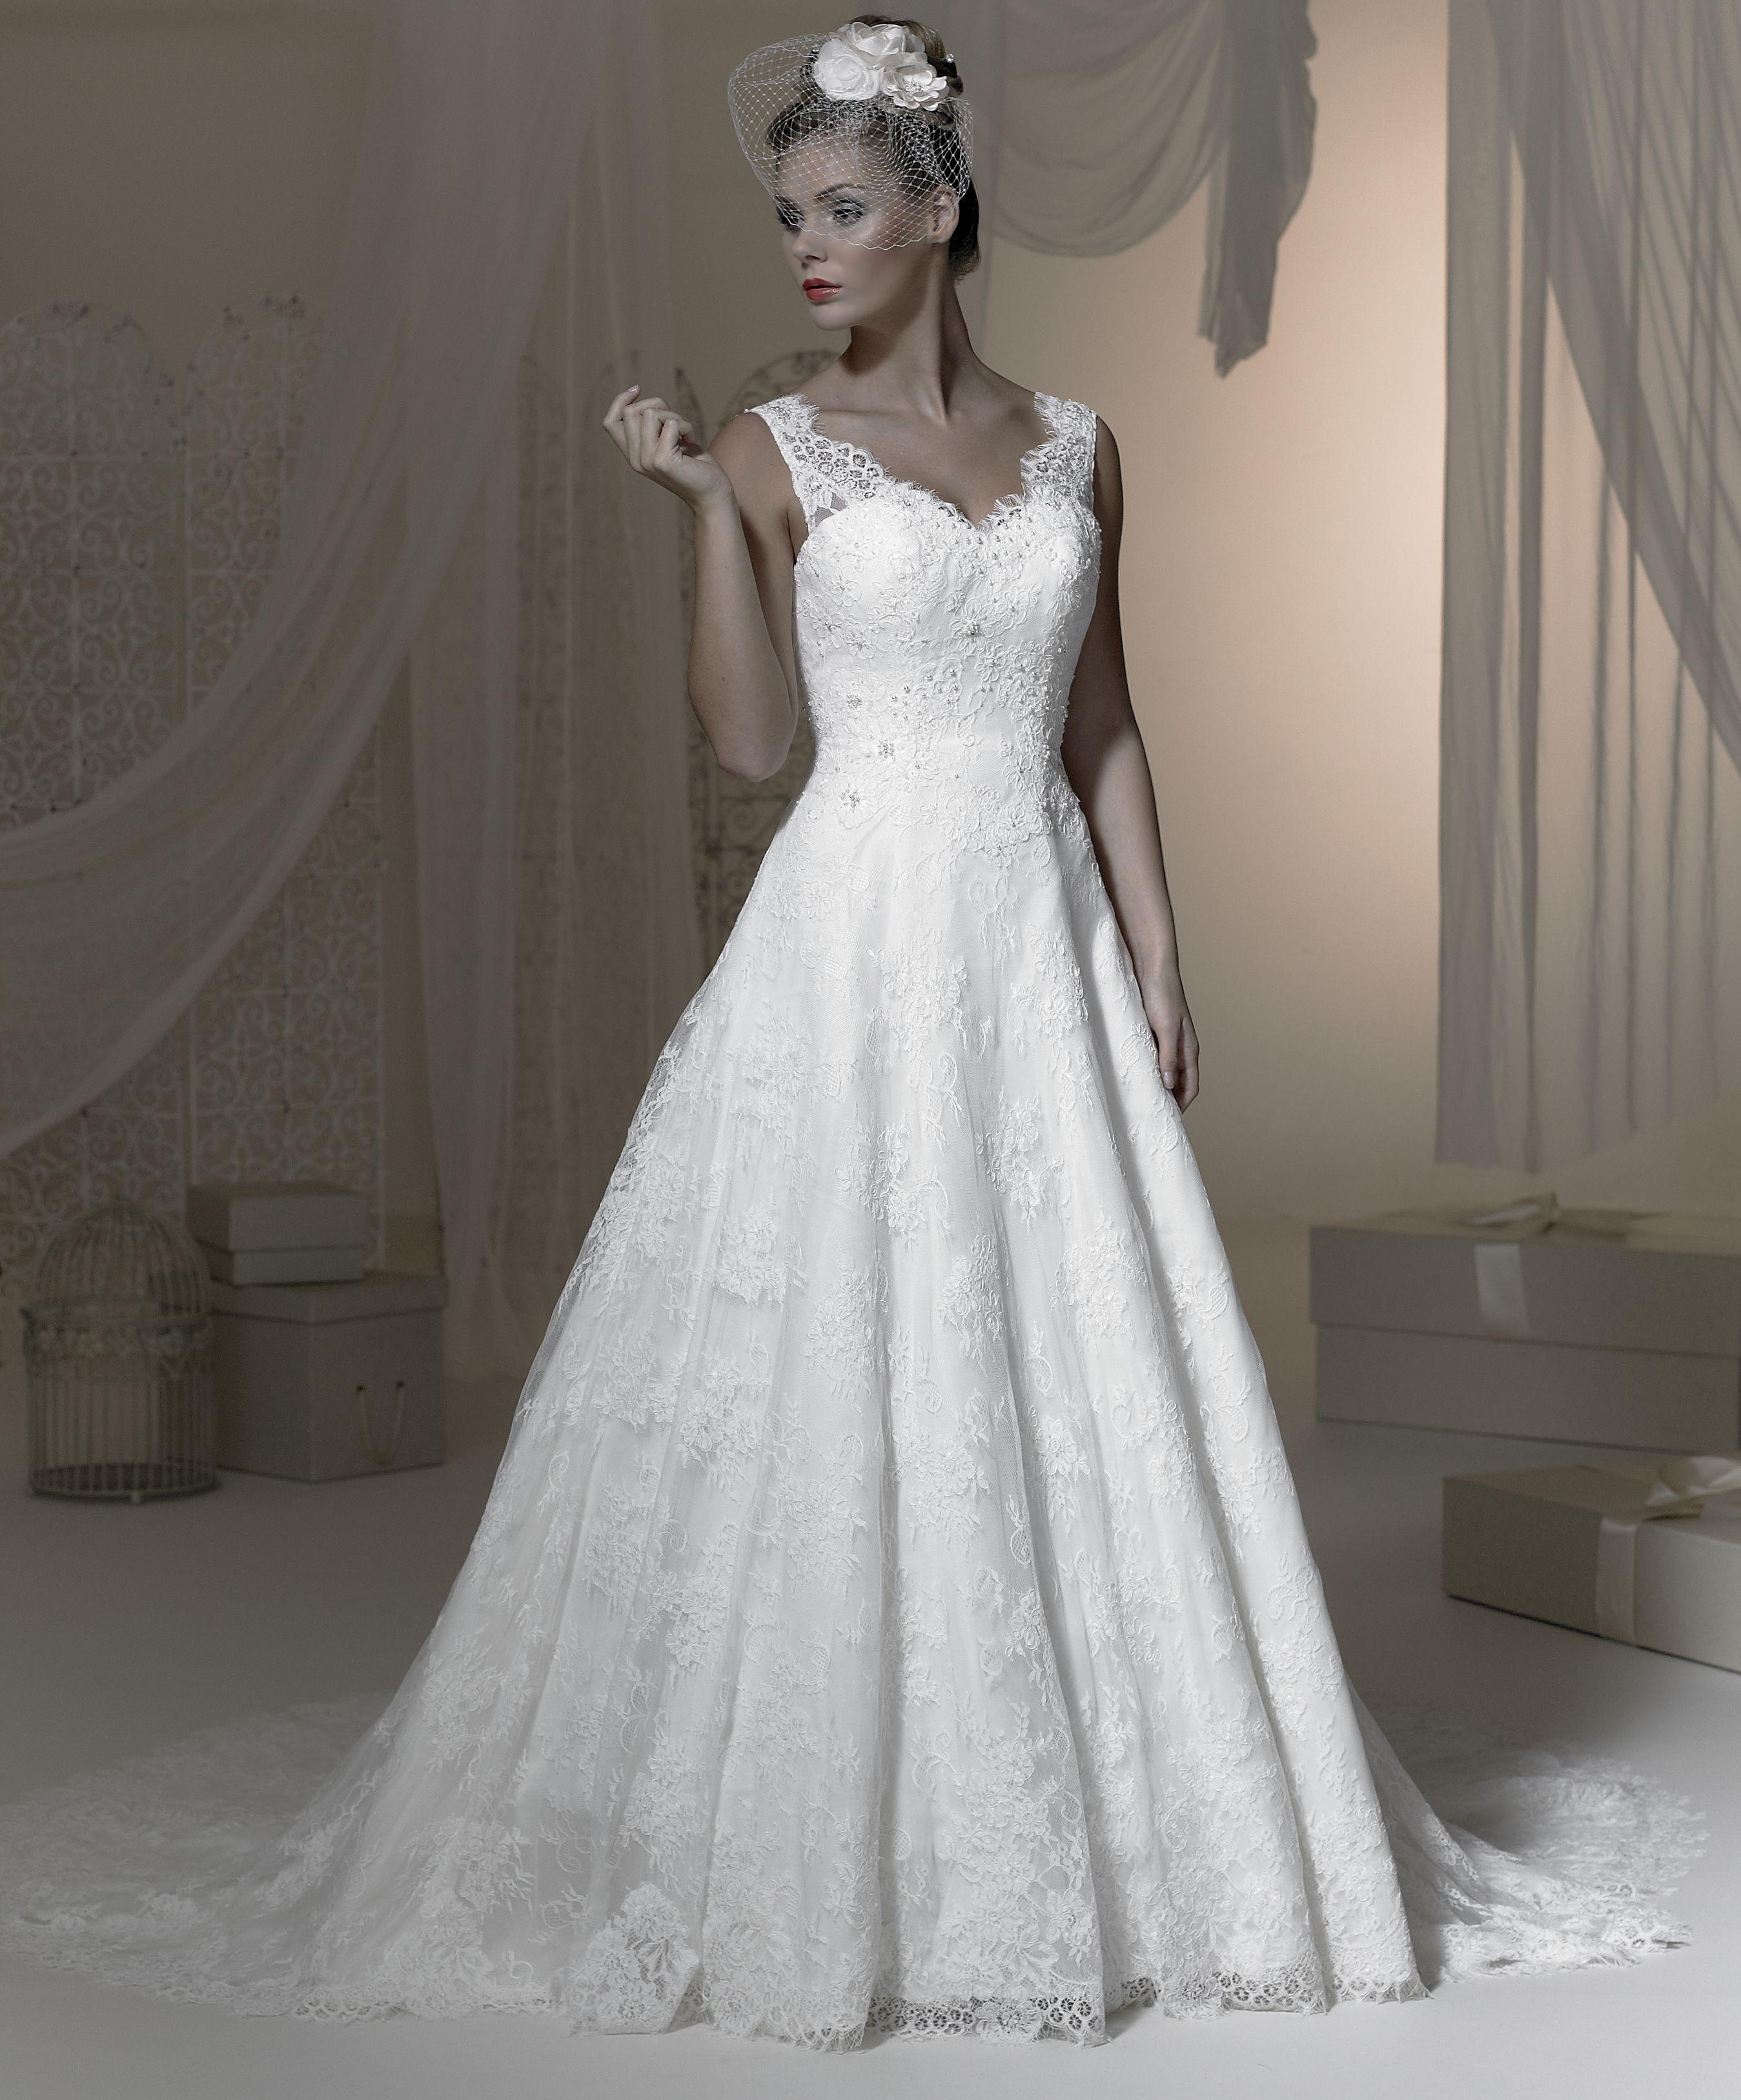 Phoenix wedding dress | Tying the knot | Pinterest | Wedding dress ...